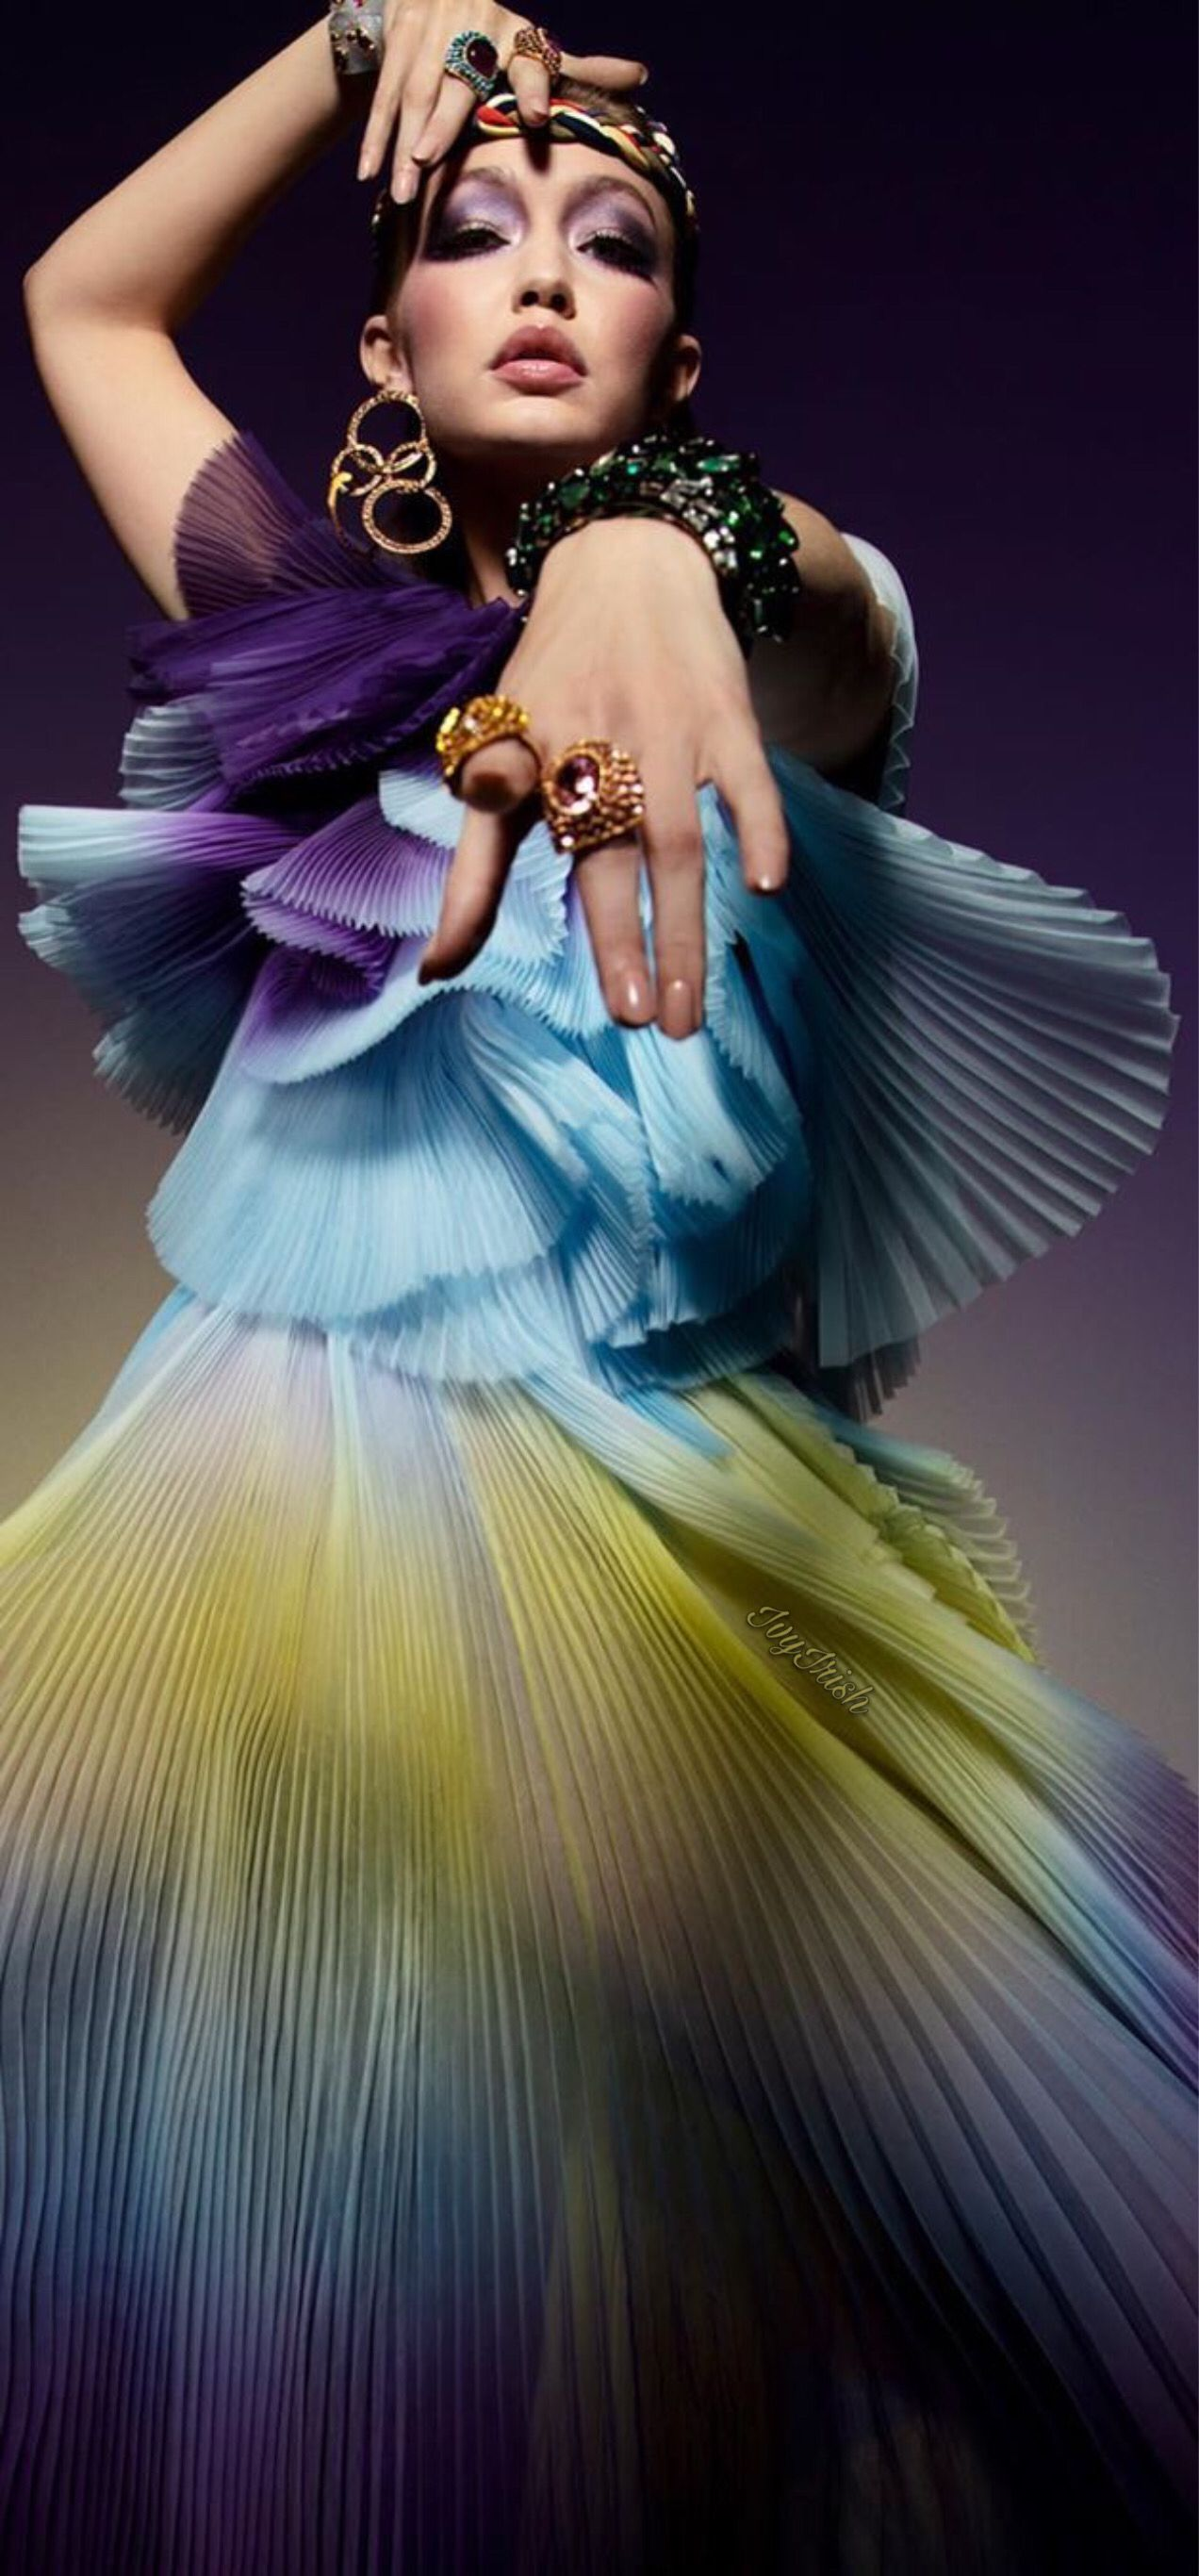 #givenchy #gigihadid #vogueparis #2020 #fashion